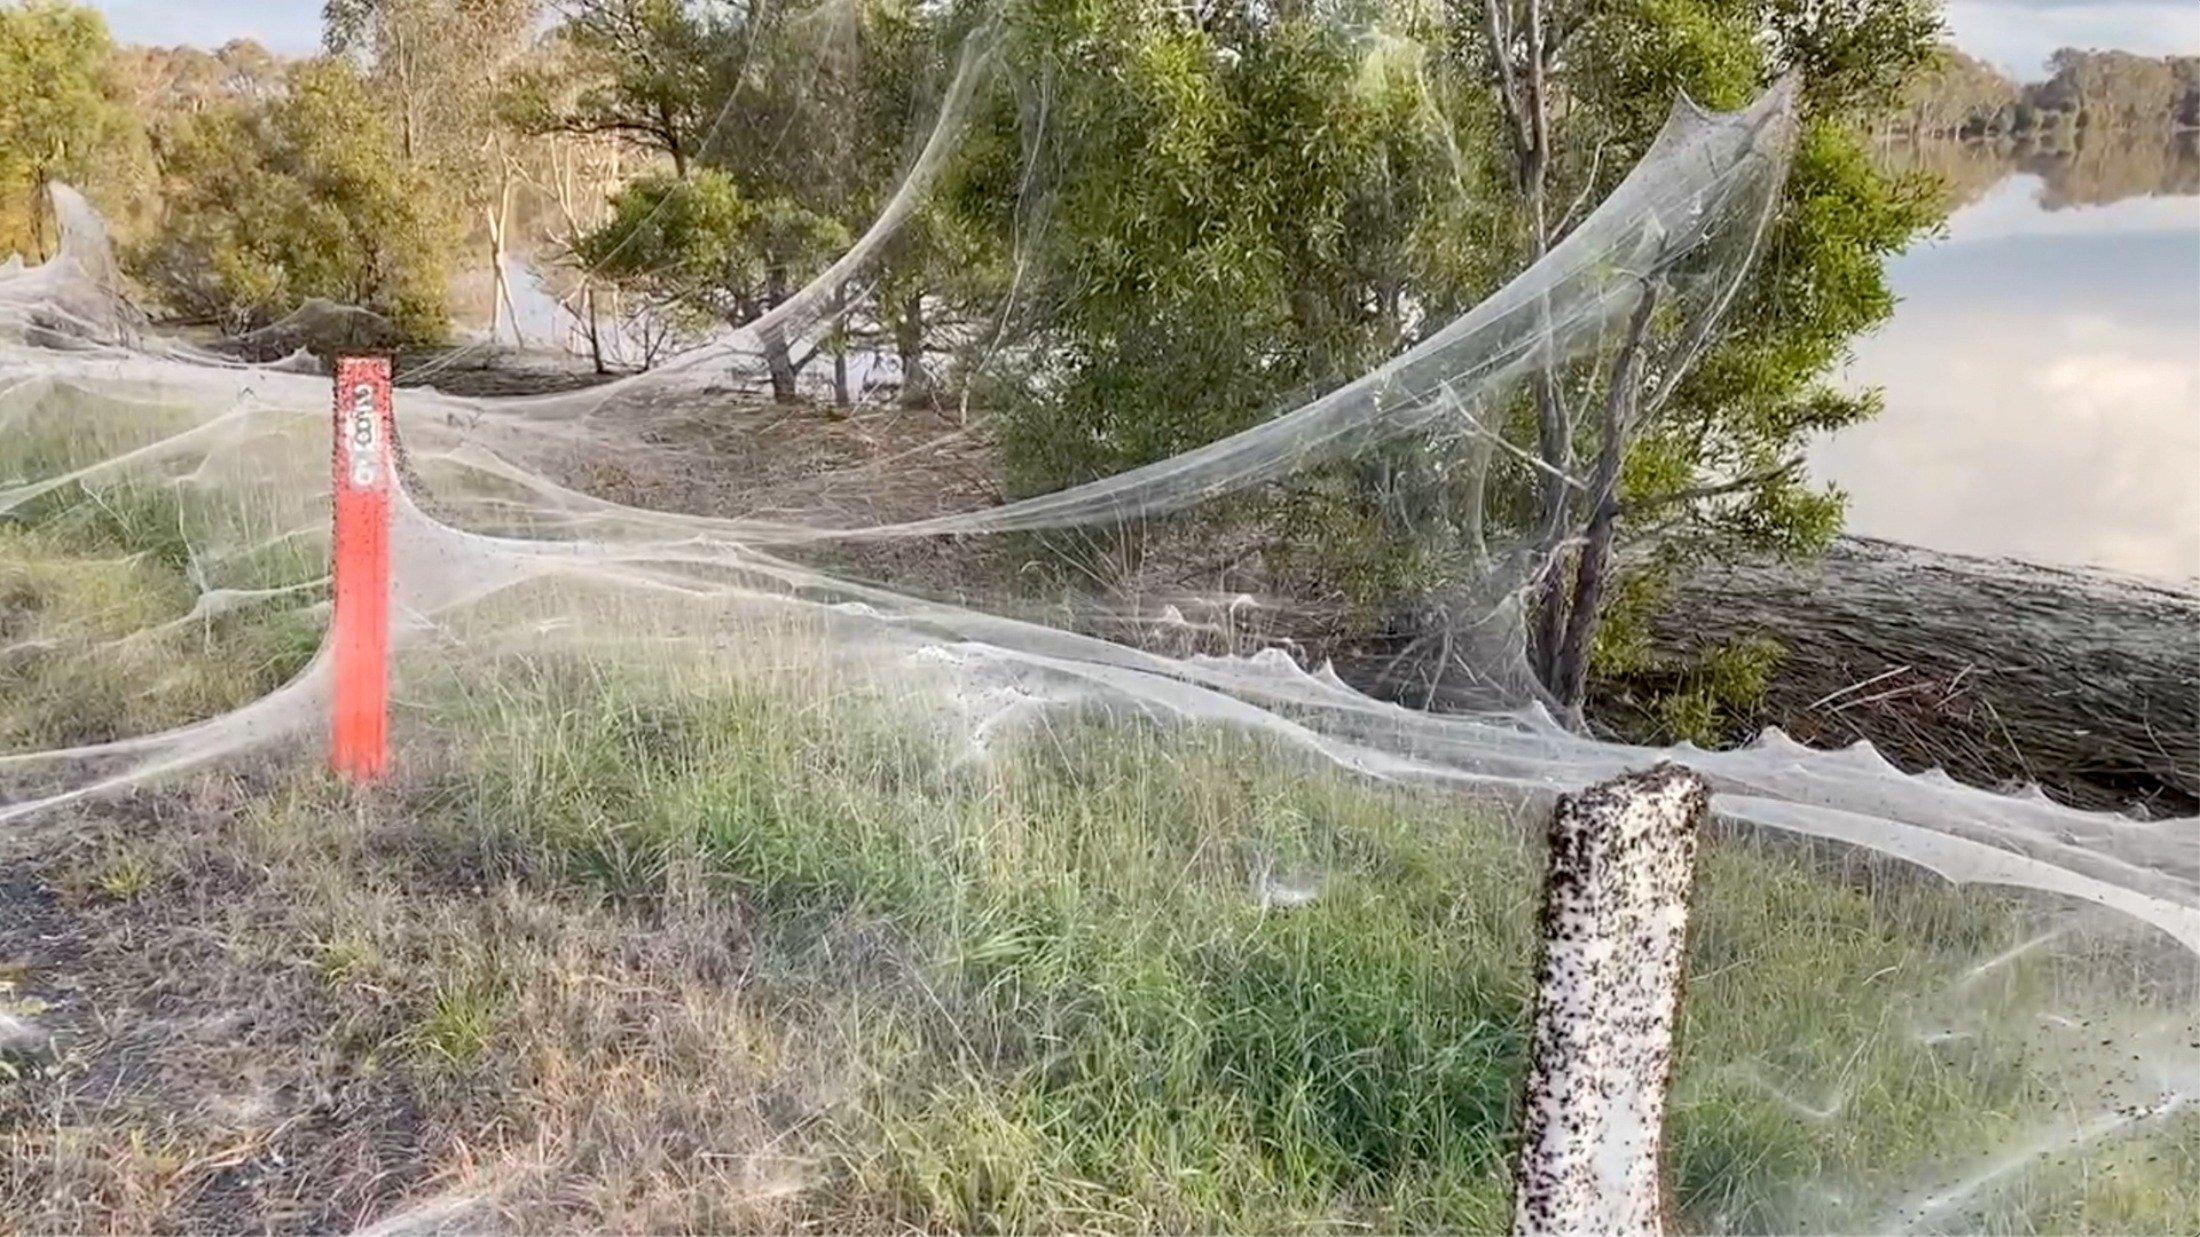 A still image from a social media video shows spiders' gossamer near wetlands in Gippsland, Victoria, Australia, June 14, 2021. (Carolyn Crossley via Reuters)